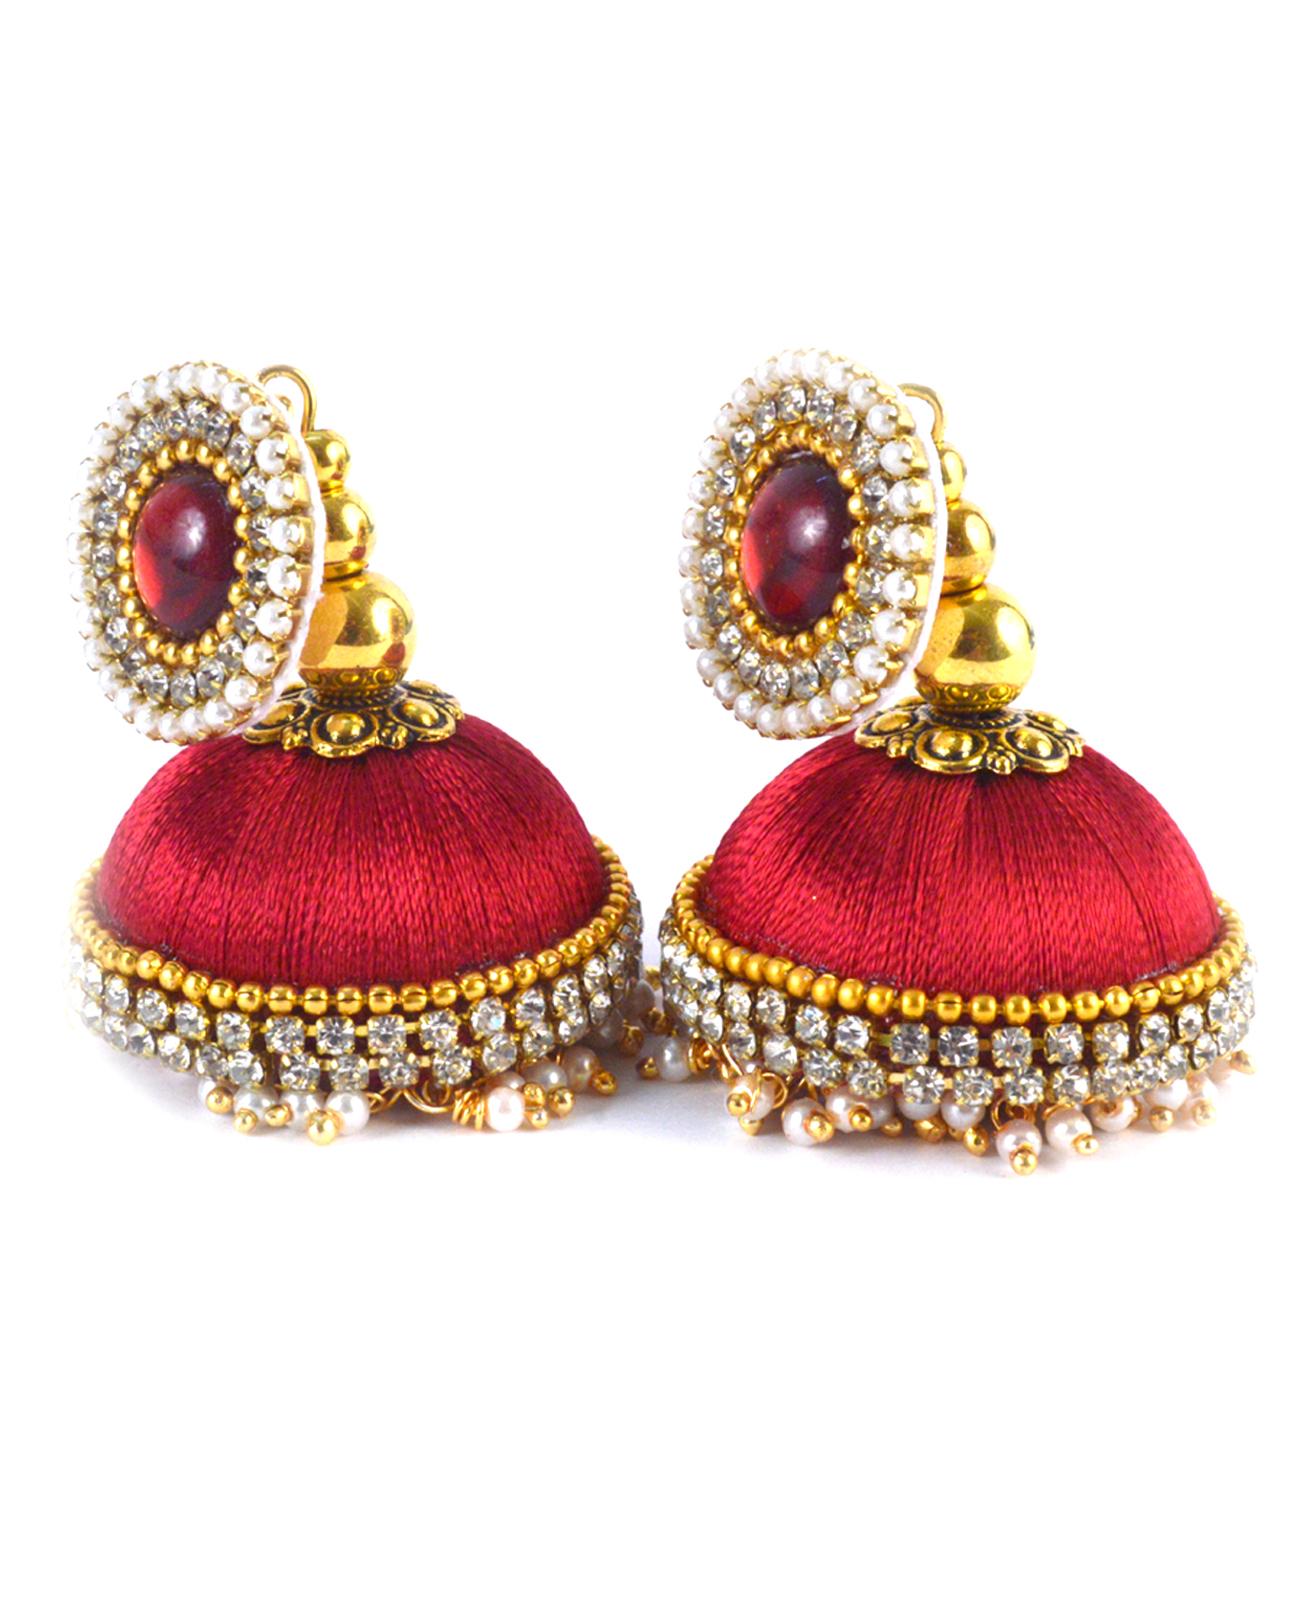 Handmade Lorial Silk Thread Earrings Red Colour